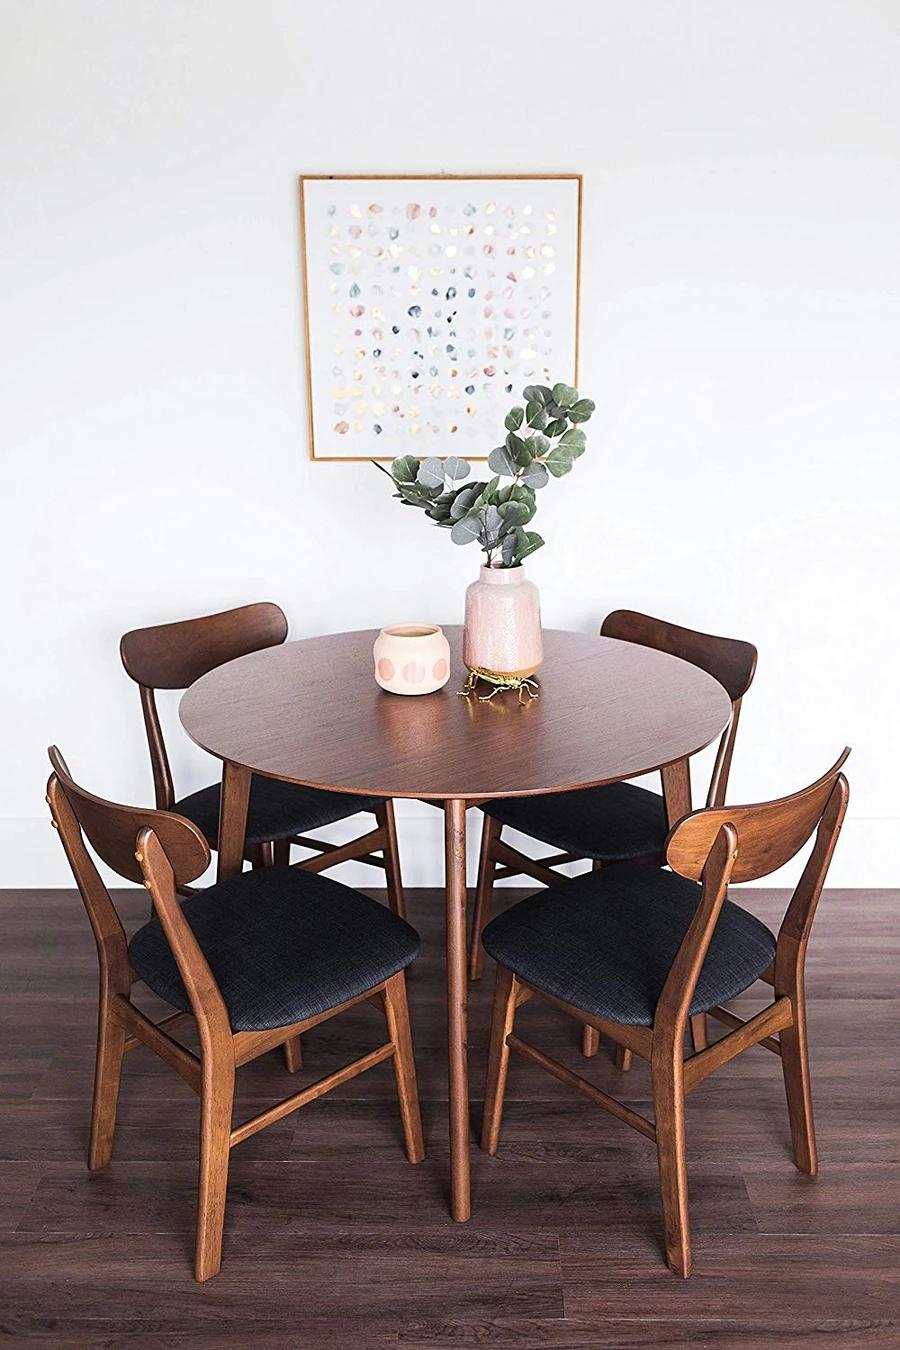 Dakota Dining Table Set Walnut Edloe Finch Furniture Co Round Dining Table Modern Dining Table Small Space Small Dining Sets